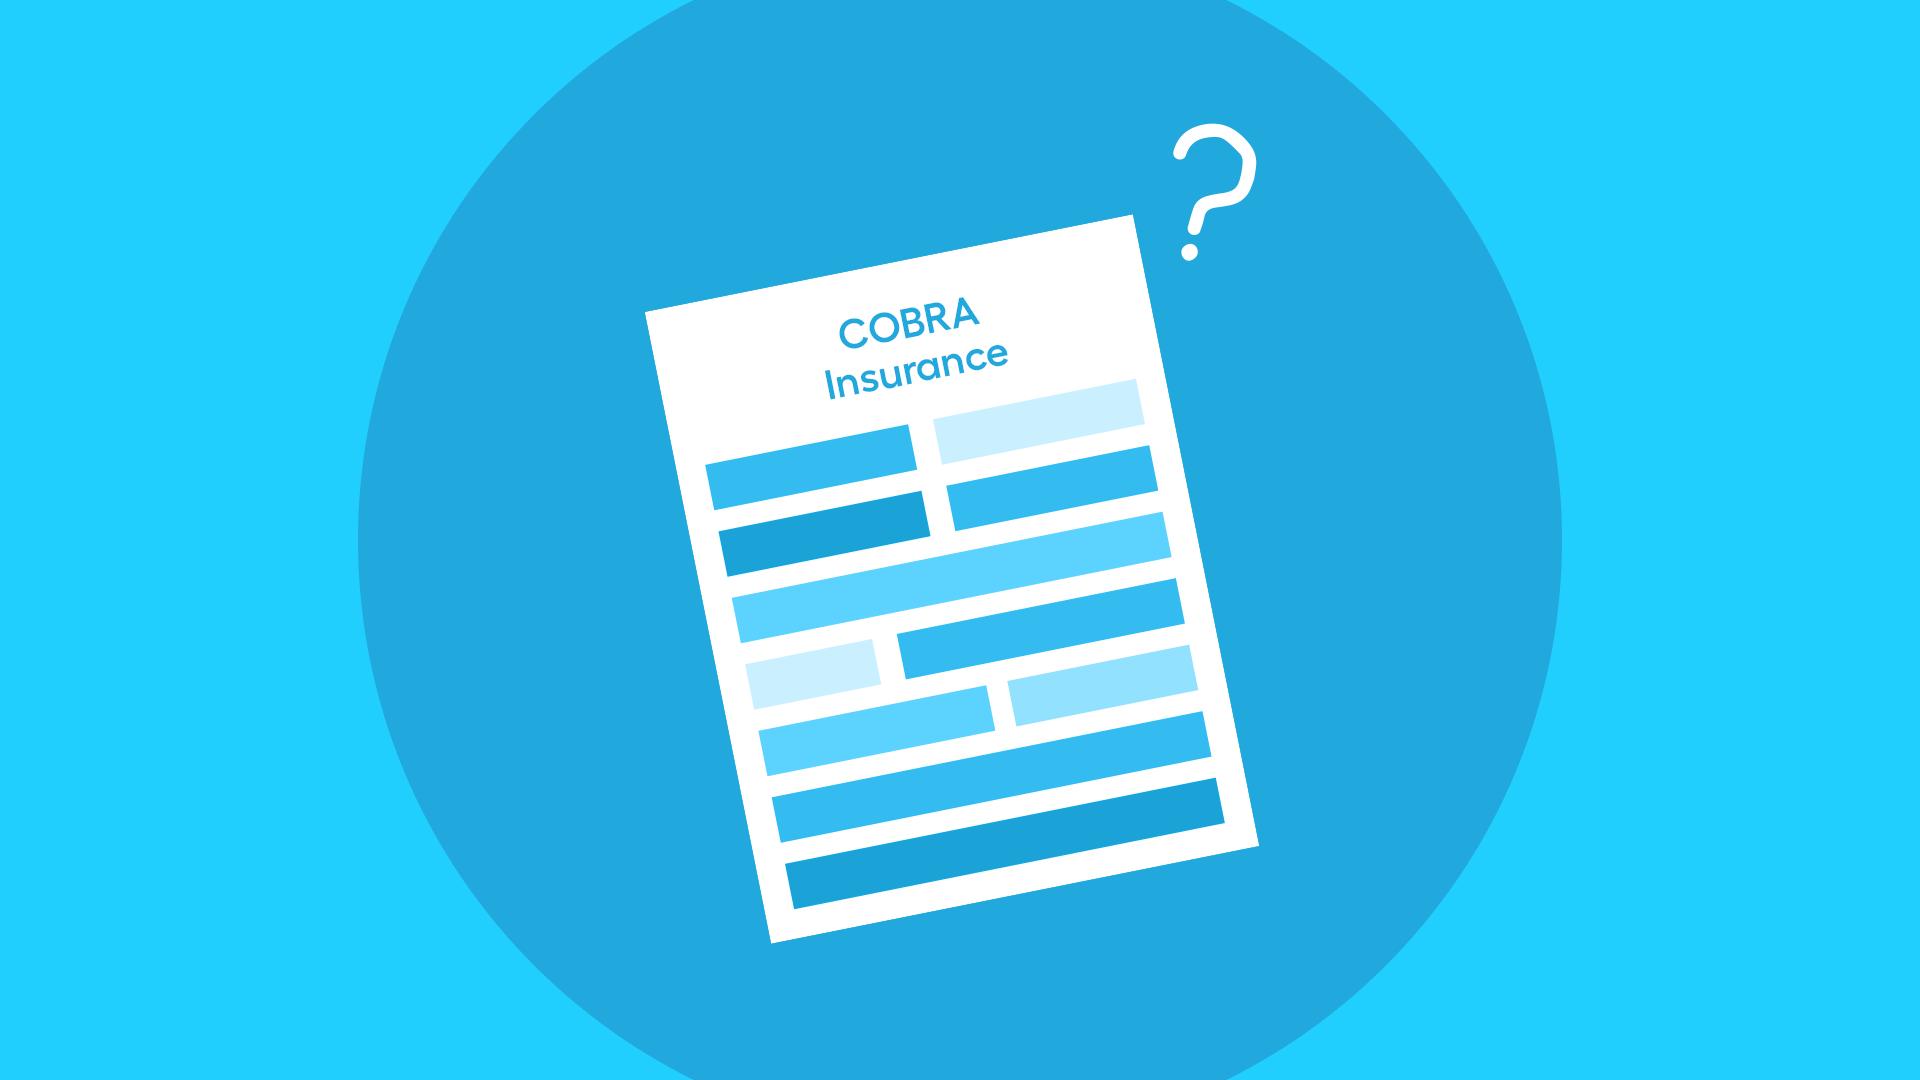 What is COBRA health insurance?